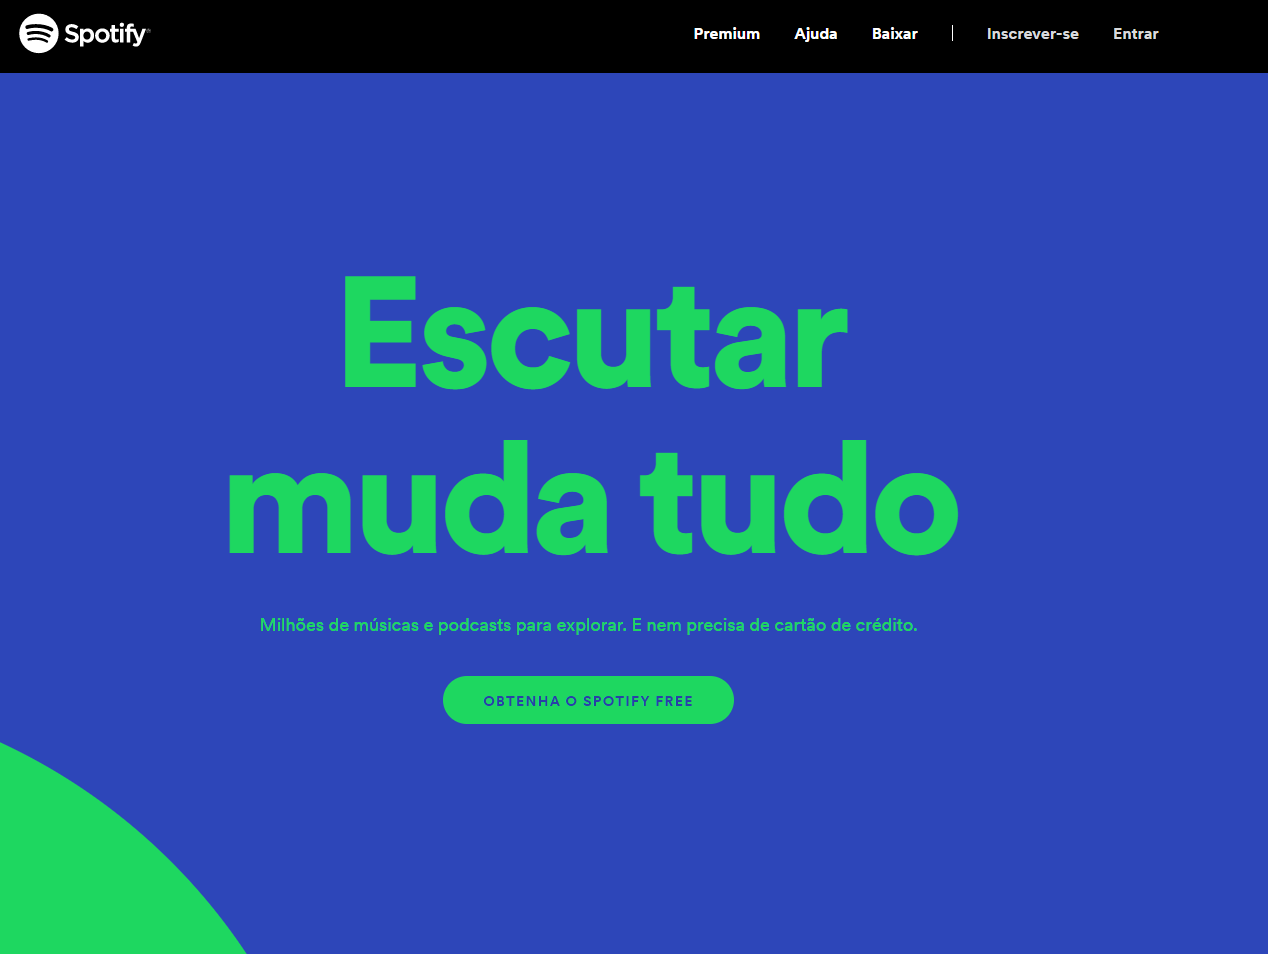 Exemplos de landing pages minimalistas: Spotify